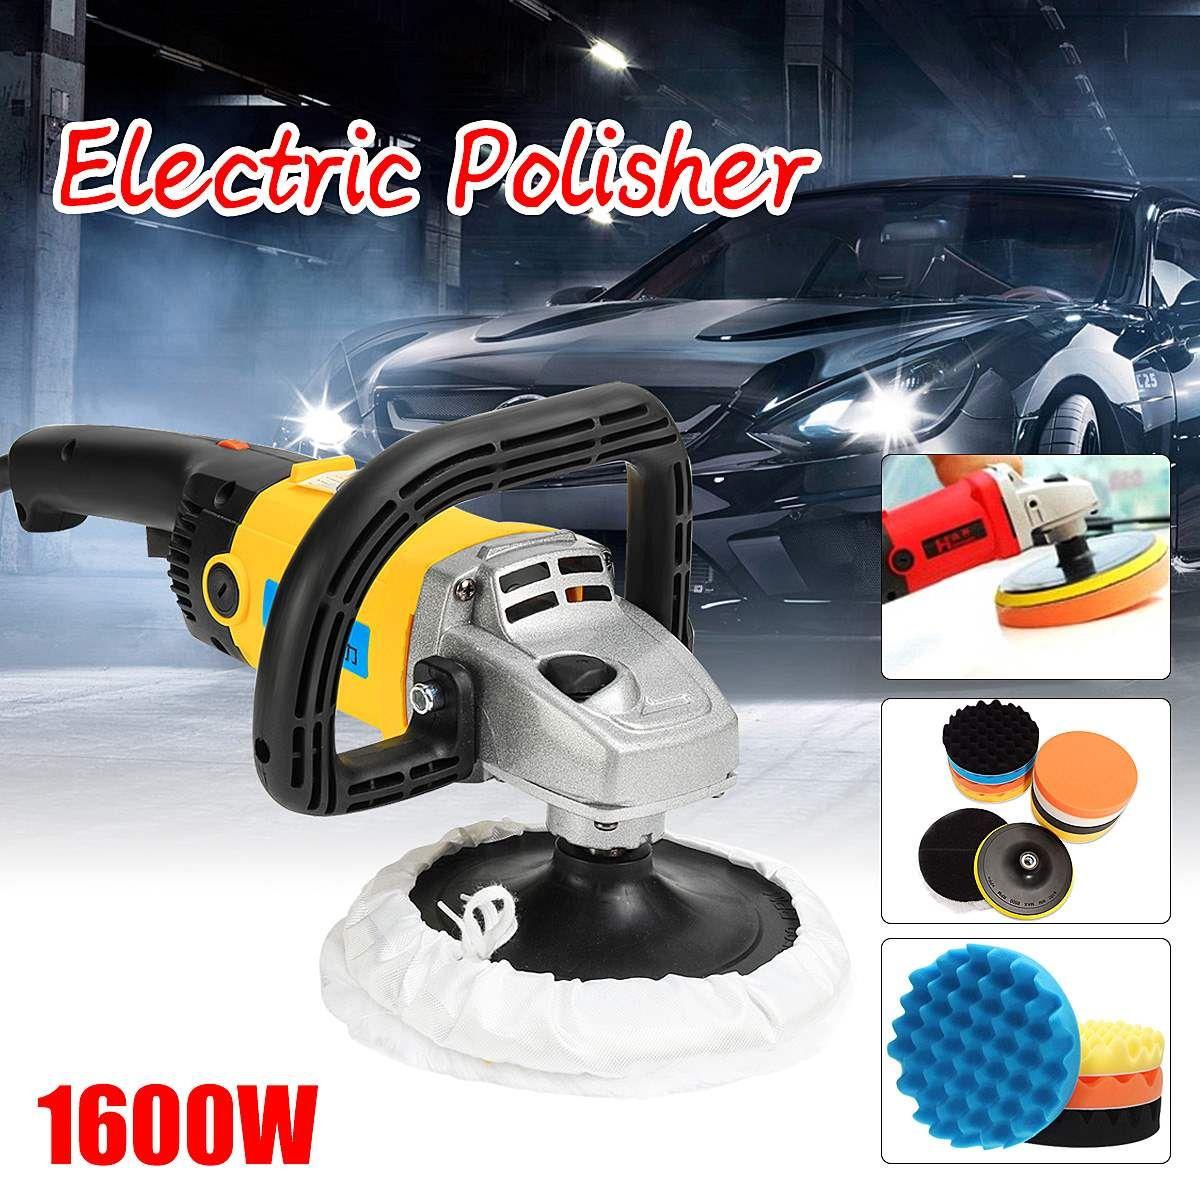 Electric Waxer 220V 1600W Polisher 1/8